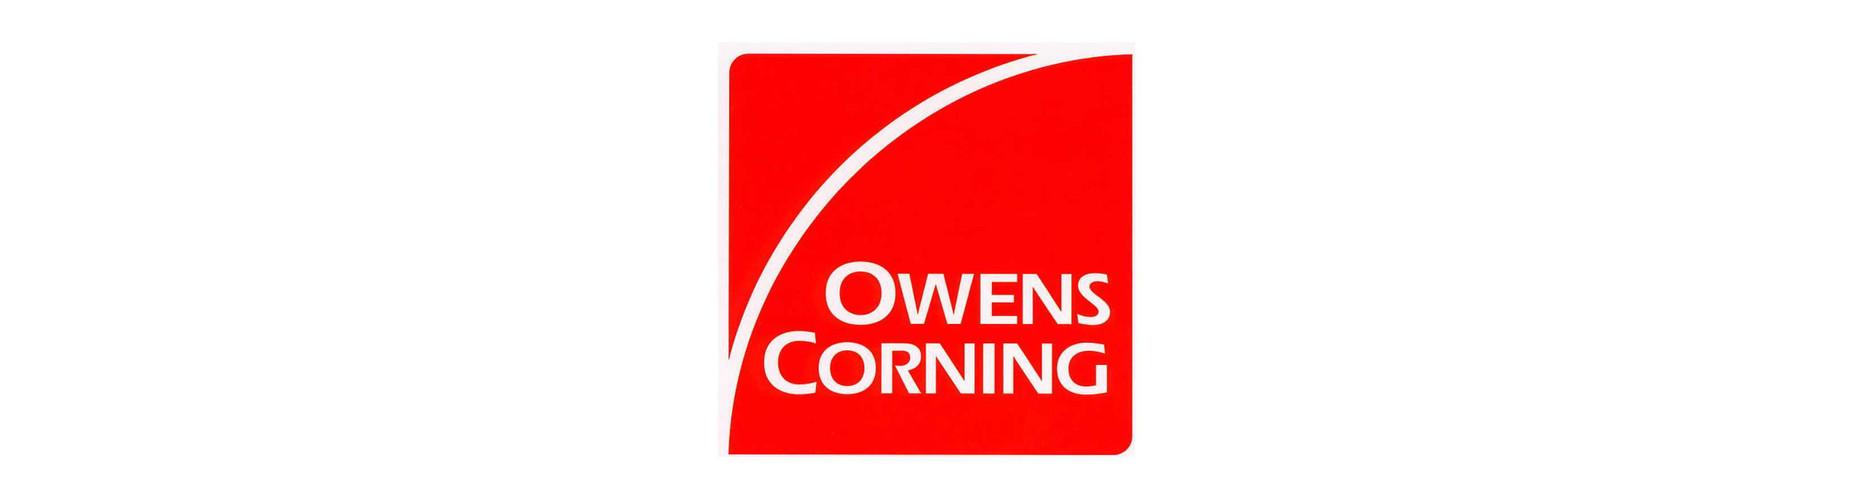 owens corning.jpg